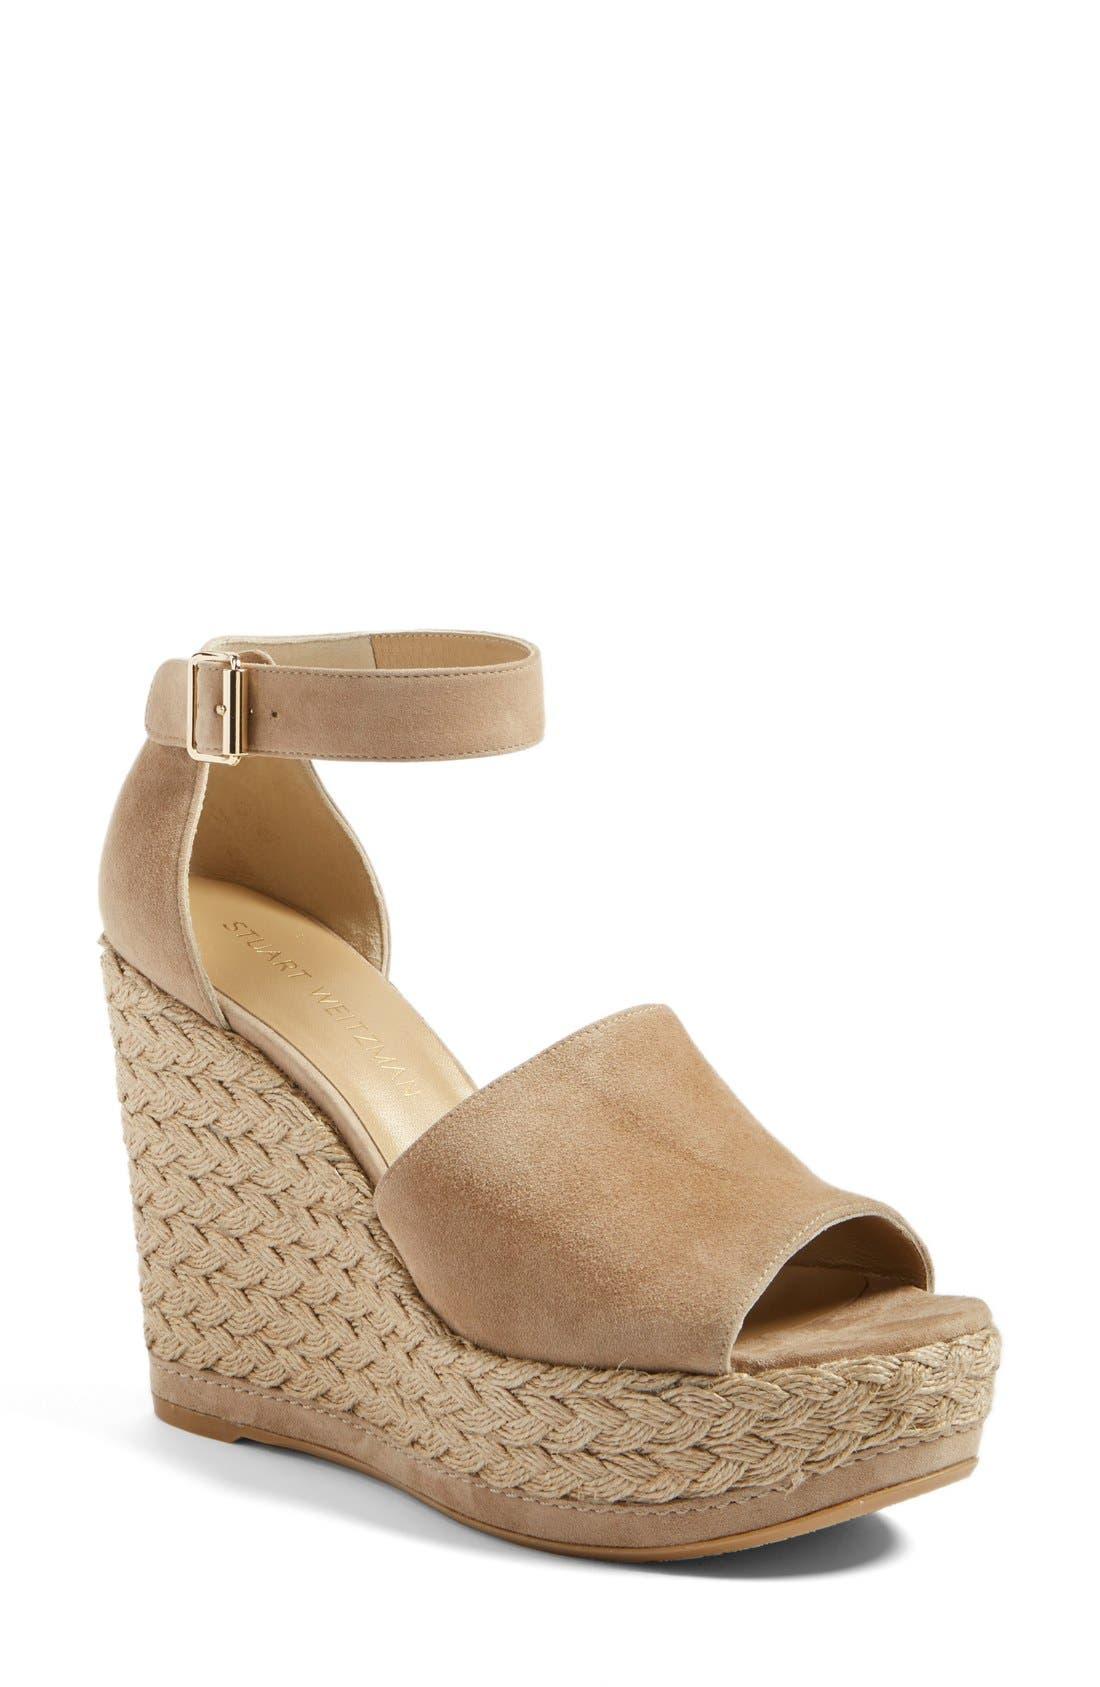 Alternate Image 1 Selected - Stuart Weitzman Sohojute Platform Wedge Sandal (Women)